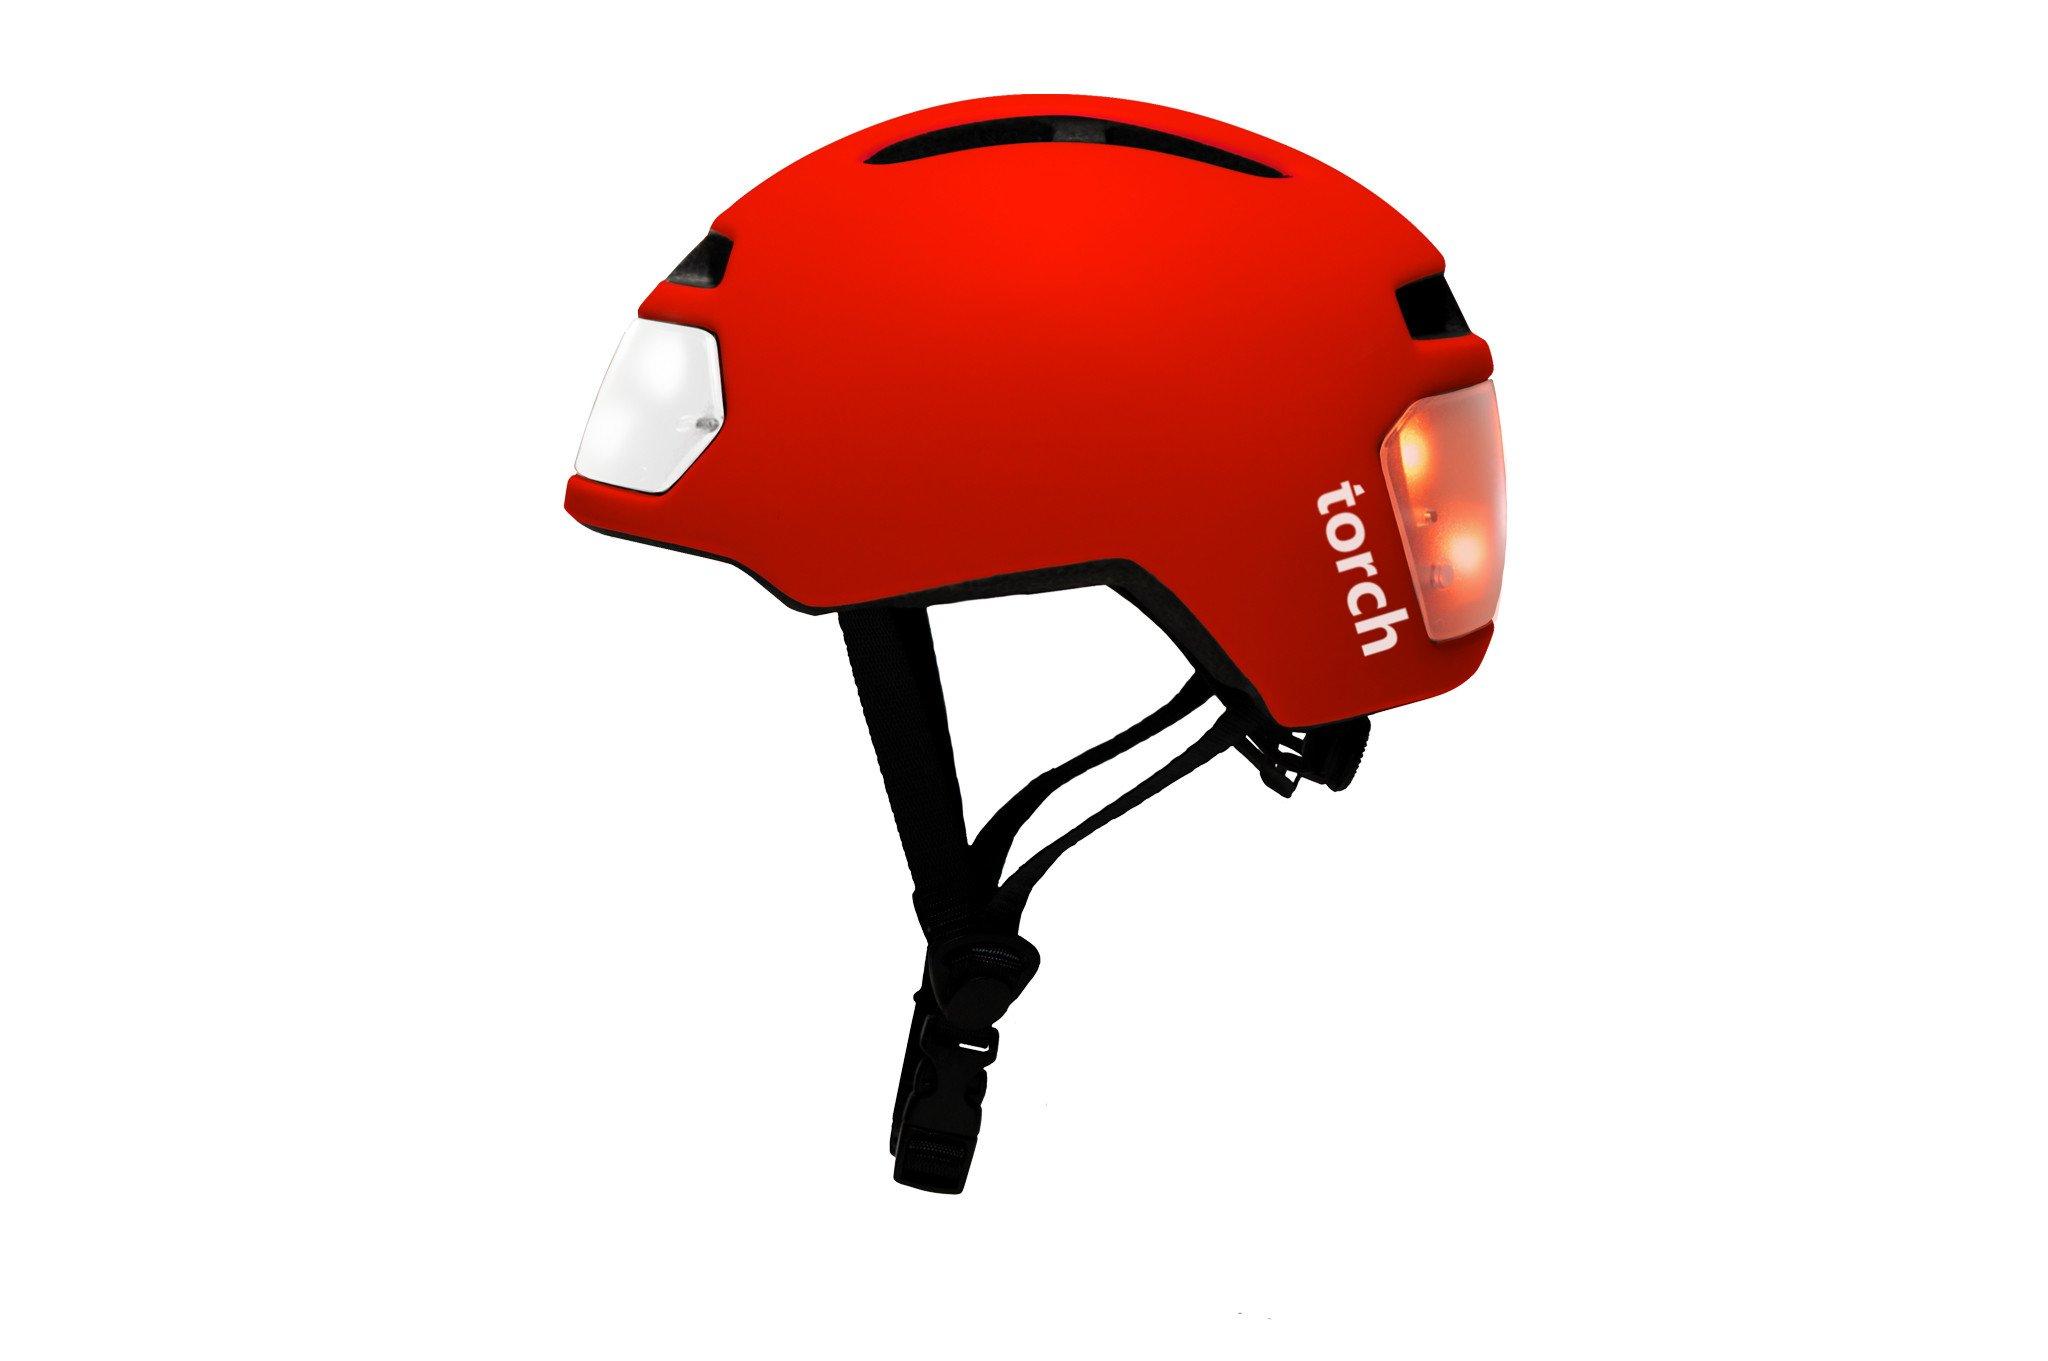 Bike lights clipart png download T2 TORCH RED BIKE HELMET png download